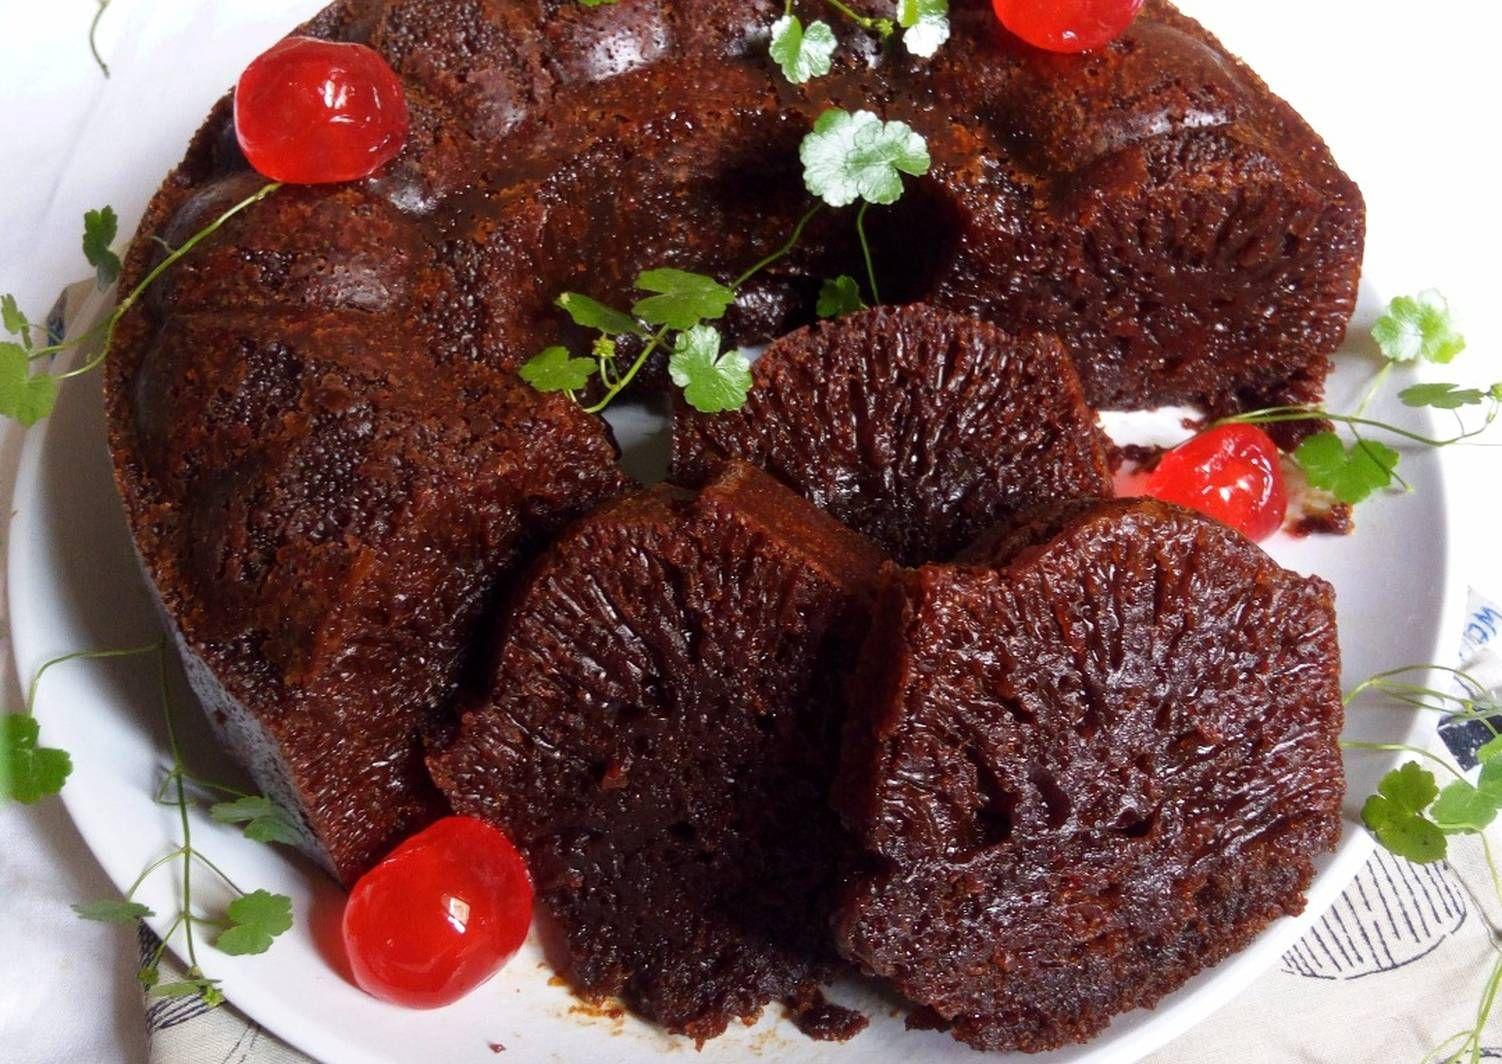 Resep Bolu Karamel Sarang Semut 5 Telur No Mixer Oleh Diyah Kuntari Resep Resep Resep Kue Kue Mentega